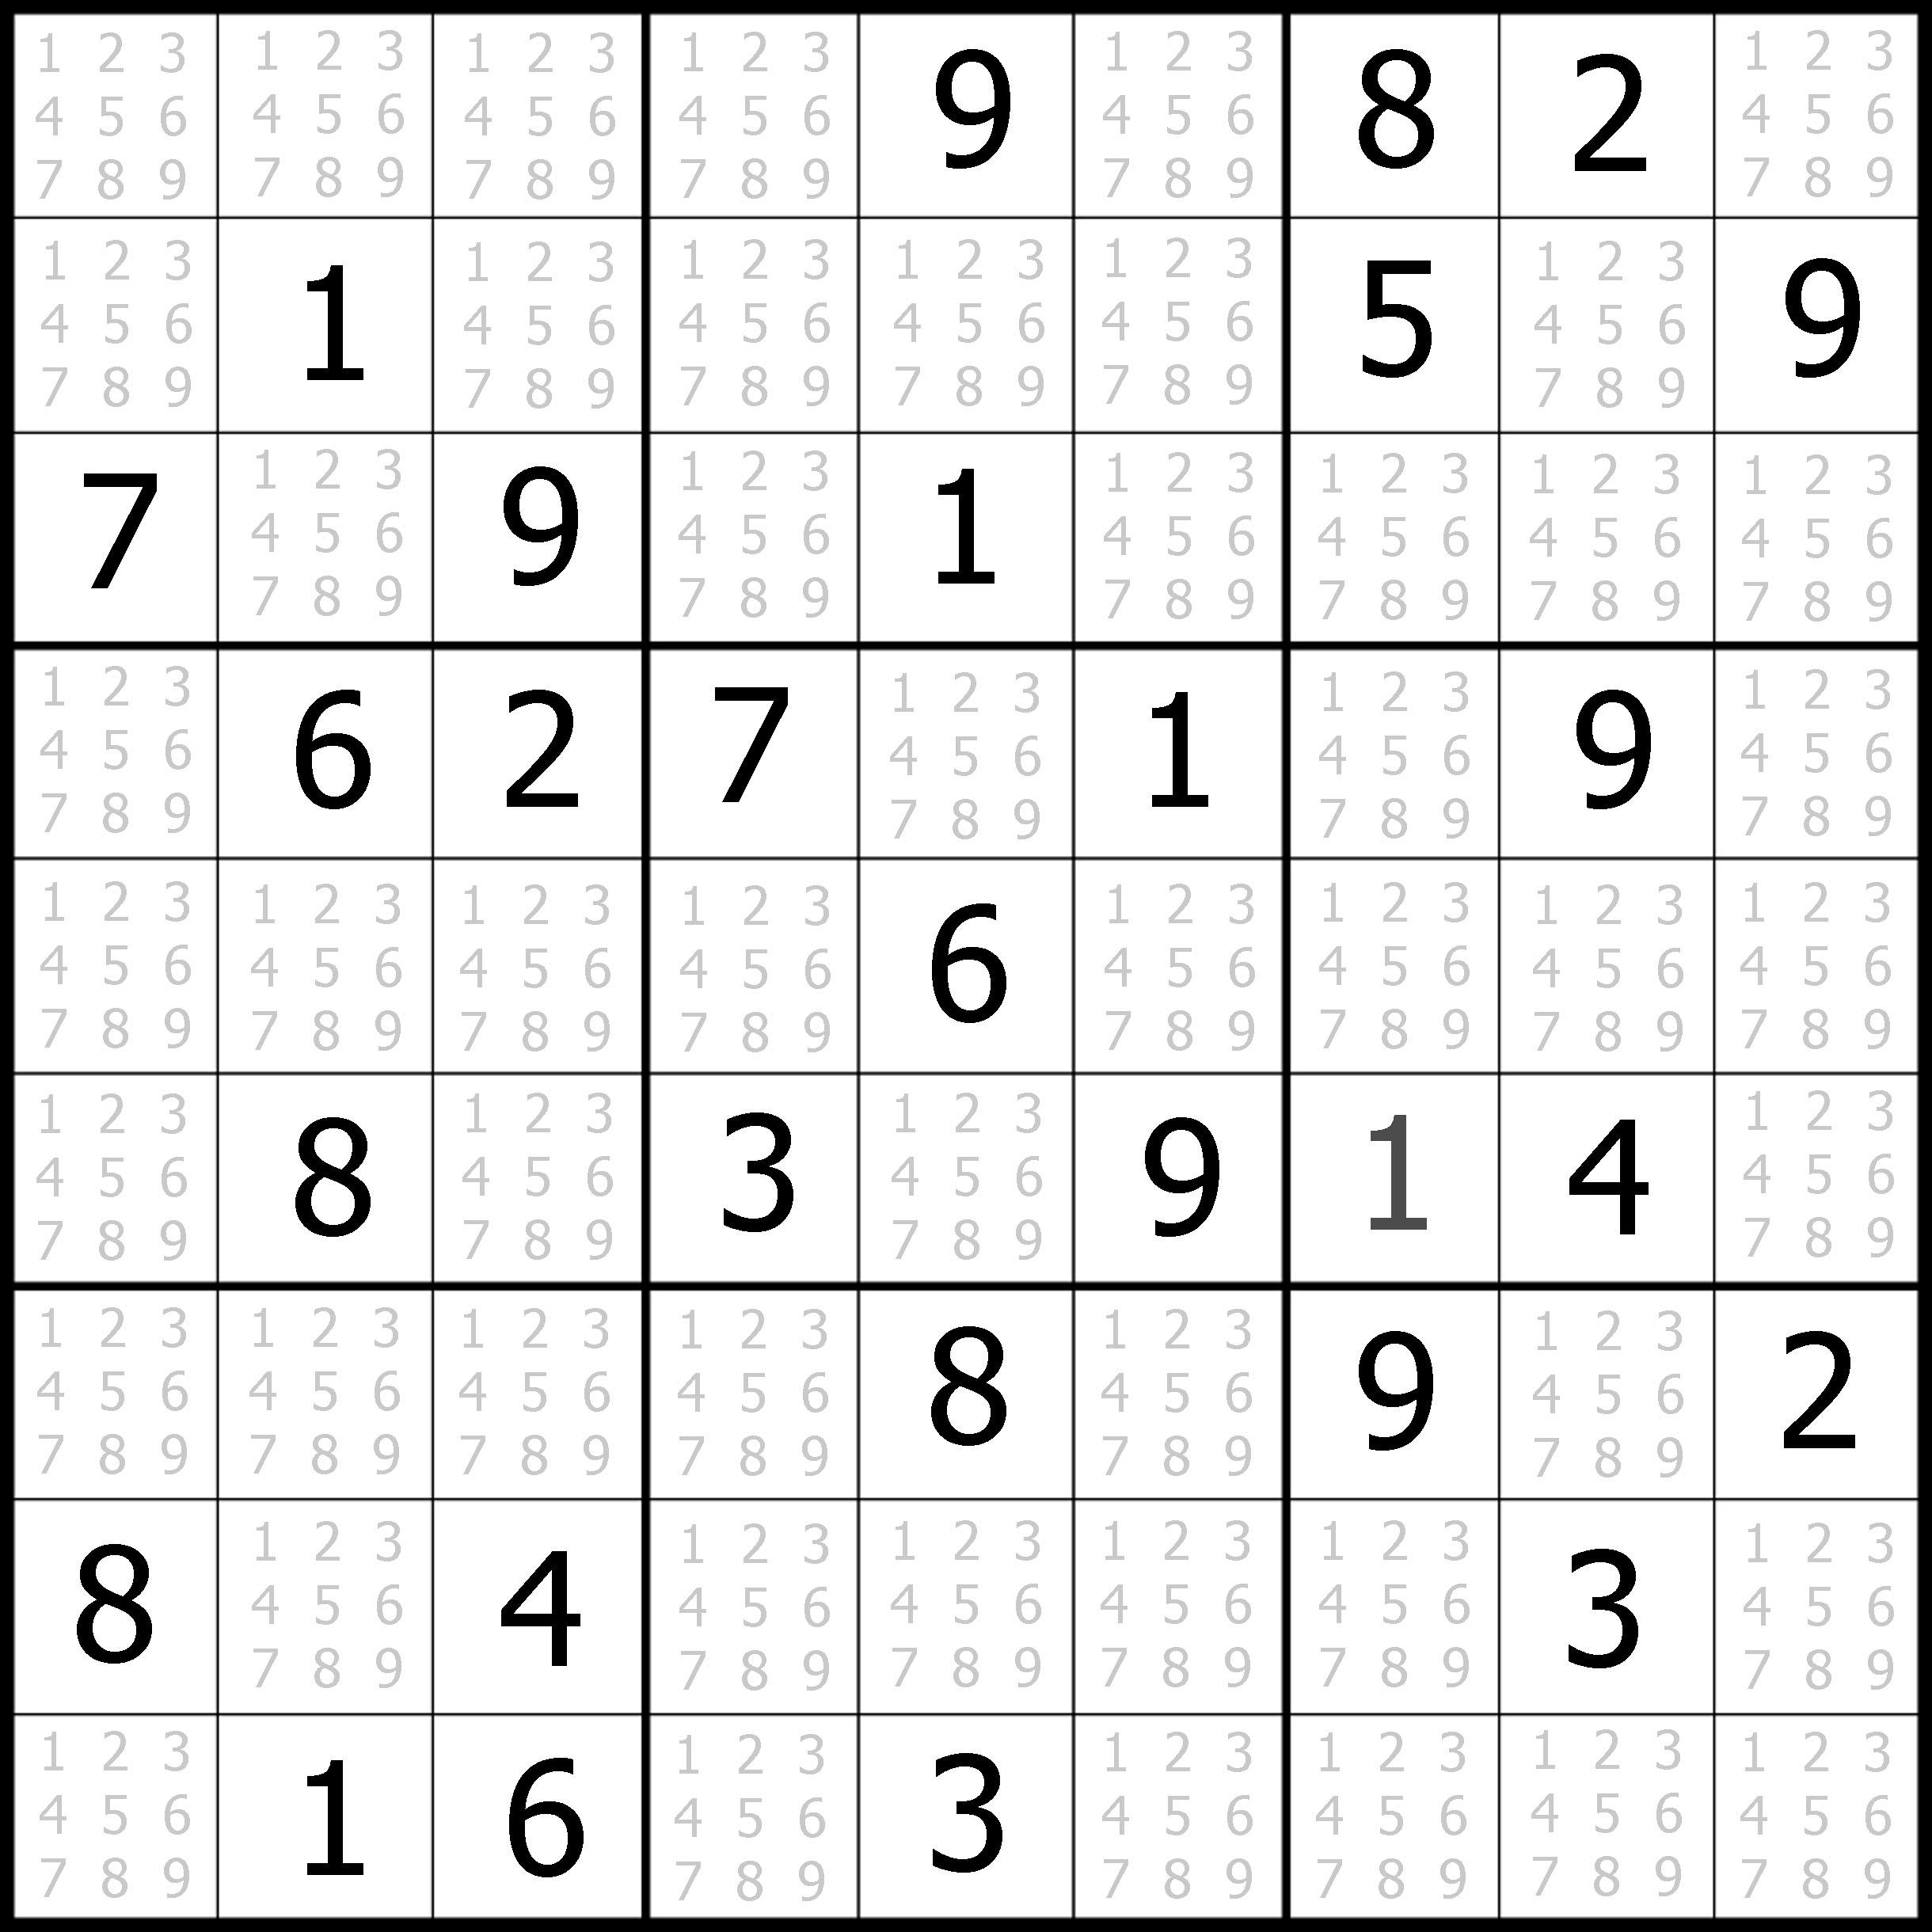 Sudoku Puzzler   Free, Printable, Updated Sudoku Puzzles With A - Printable Sudoku Puzzles Easy #6